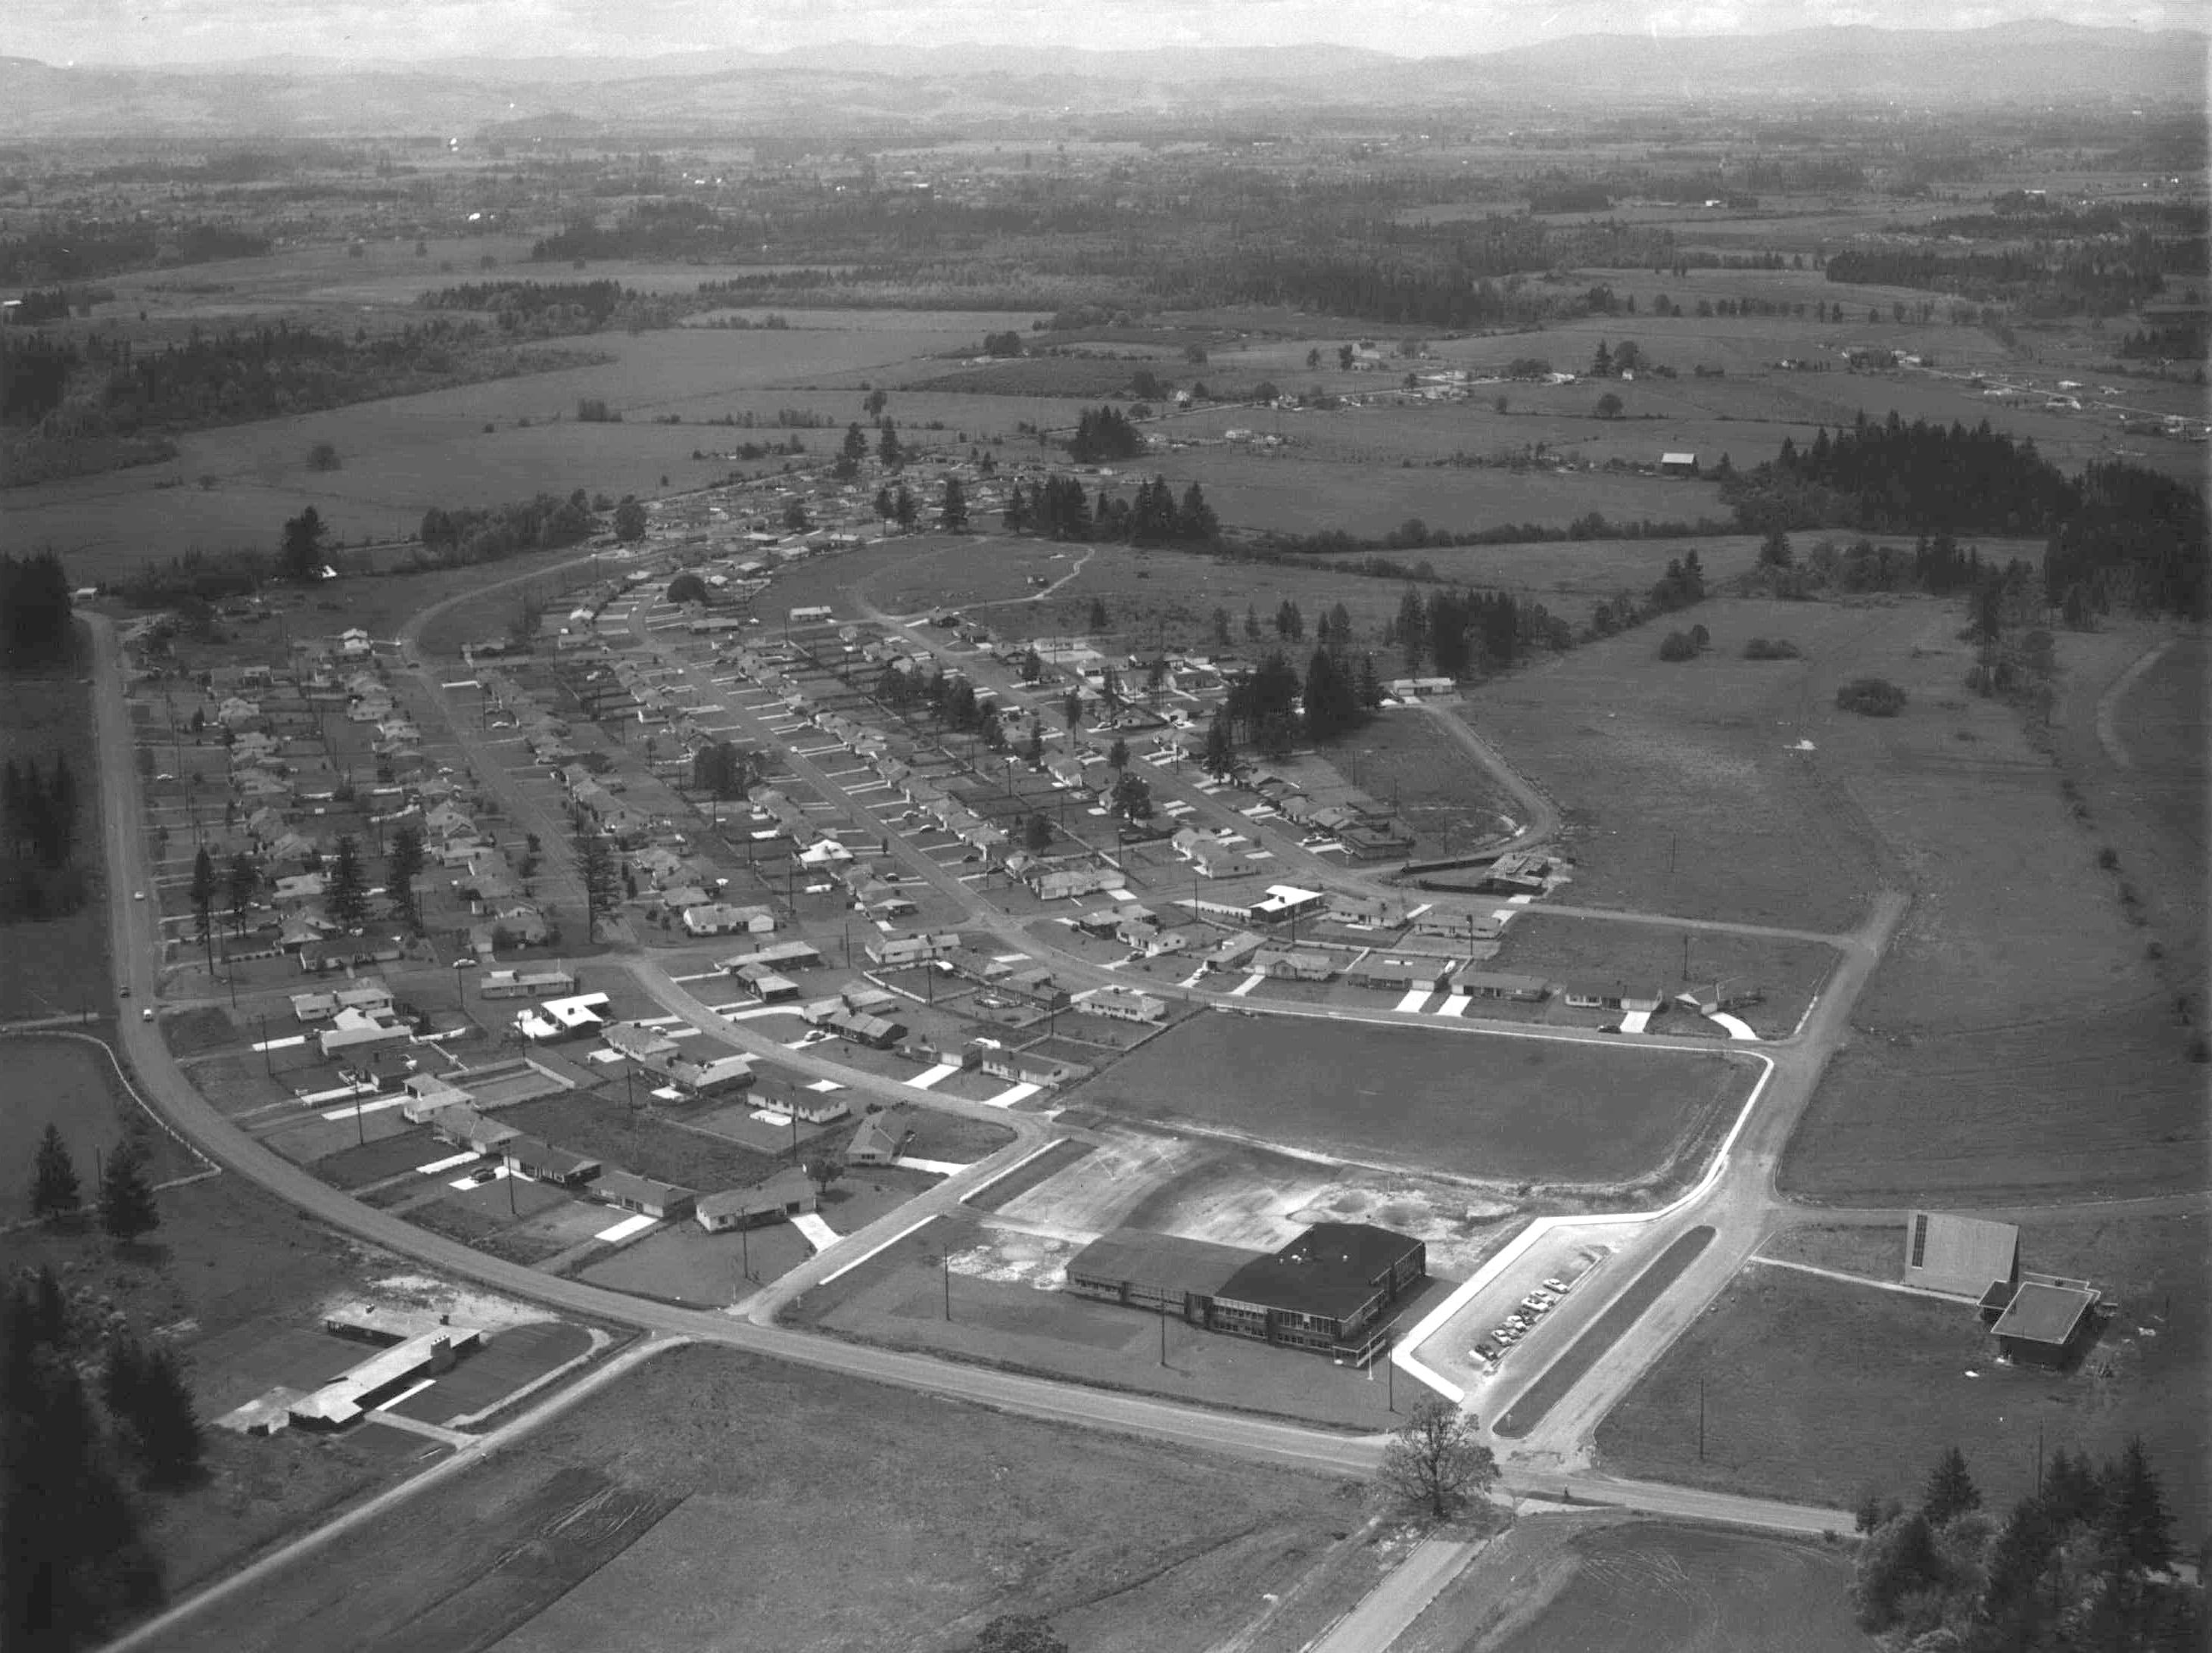 Beaverton Community Center Room Reservation